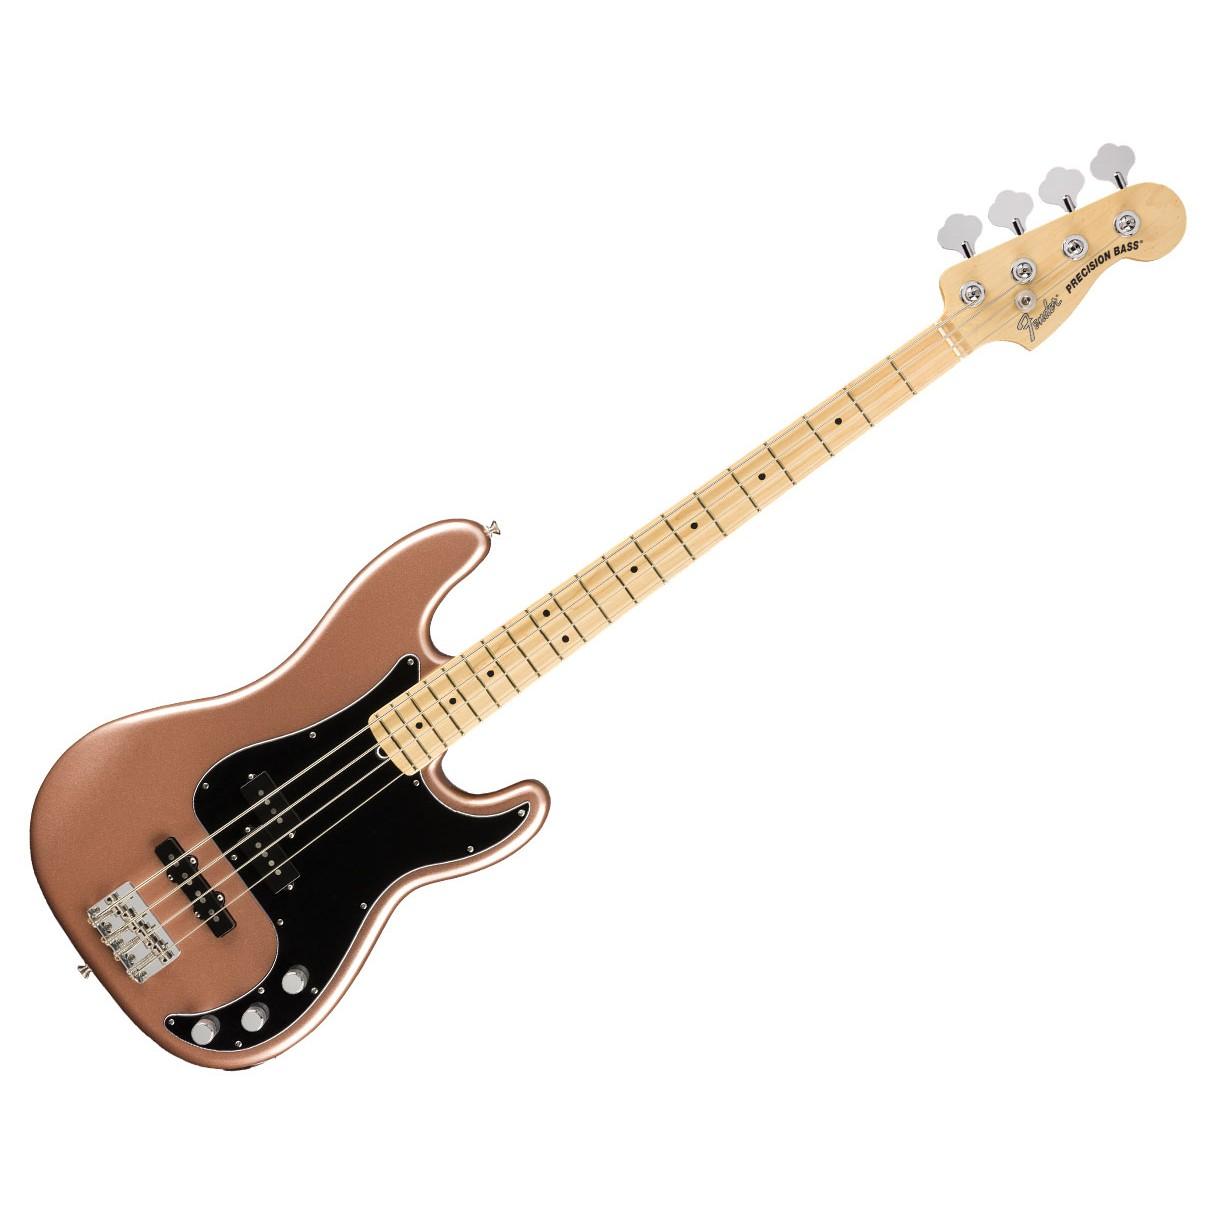 fender american performer precision bass penny w maple fingerboard. Black Bedroom Furniture Sets. Home Design Ideas